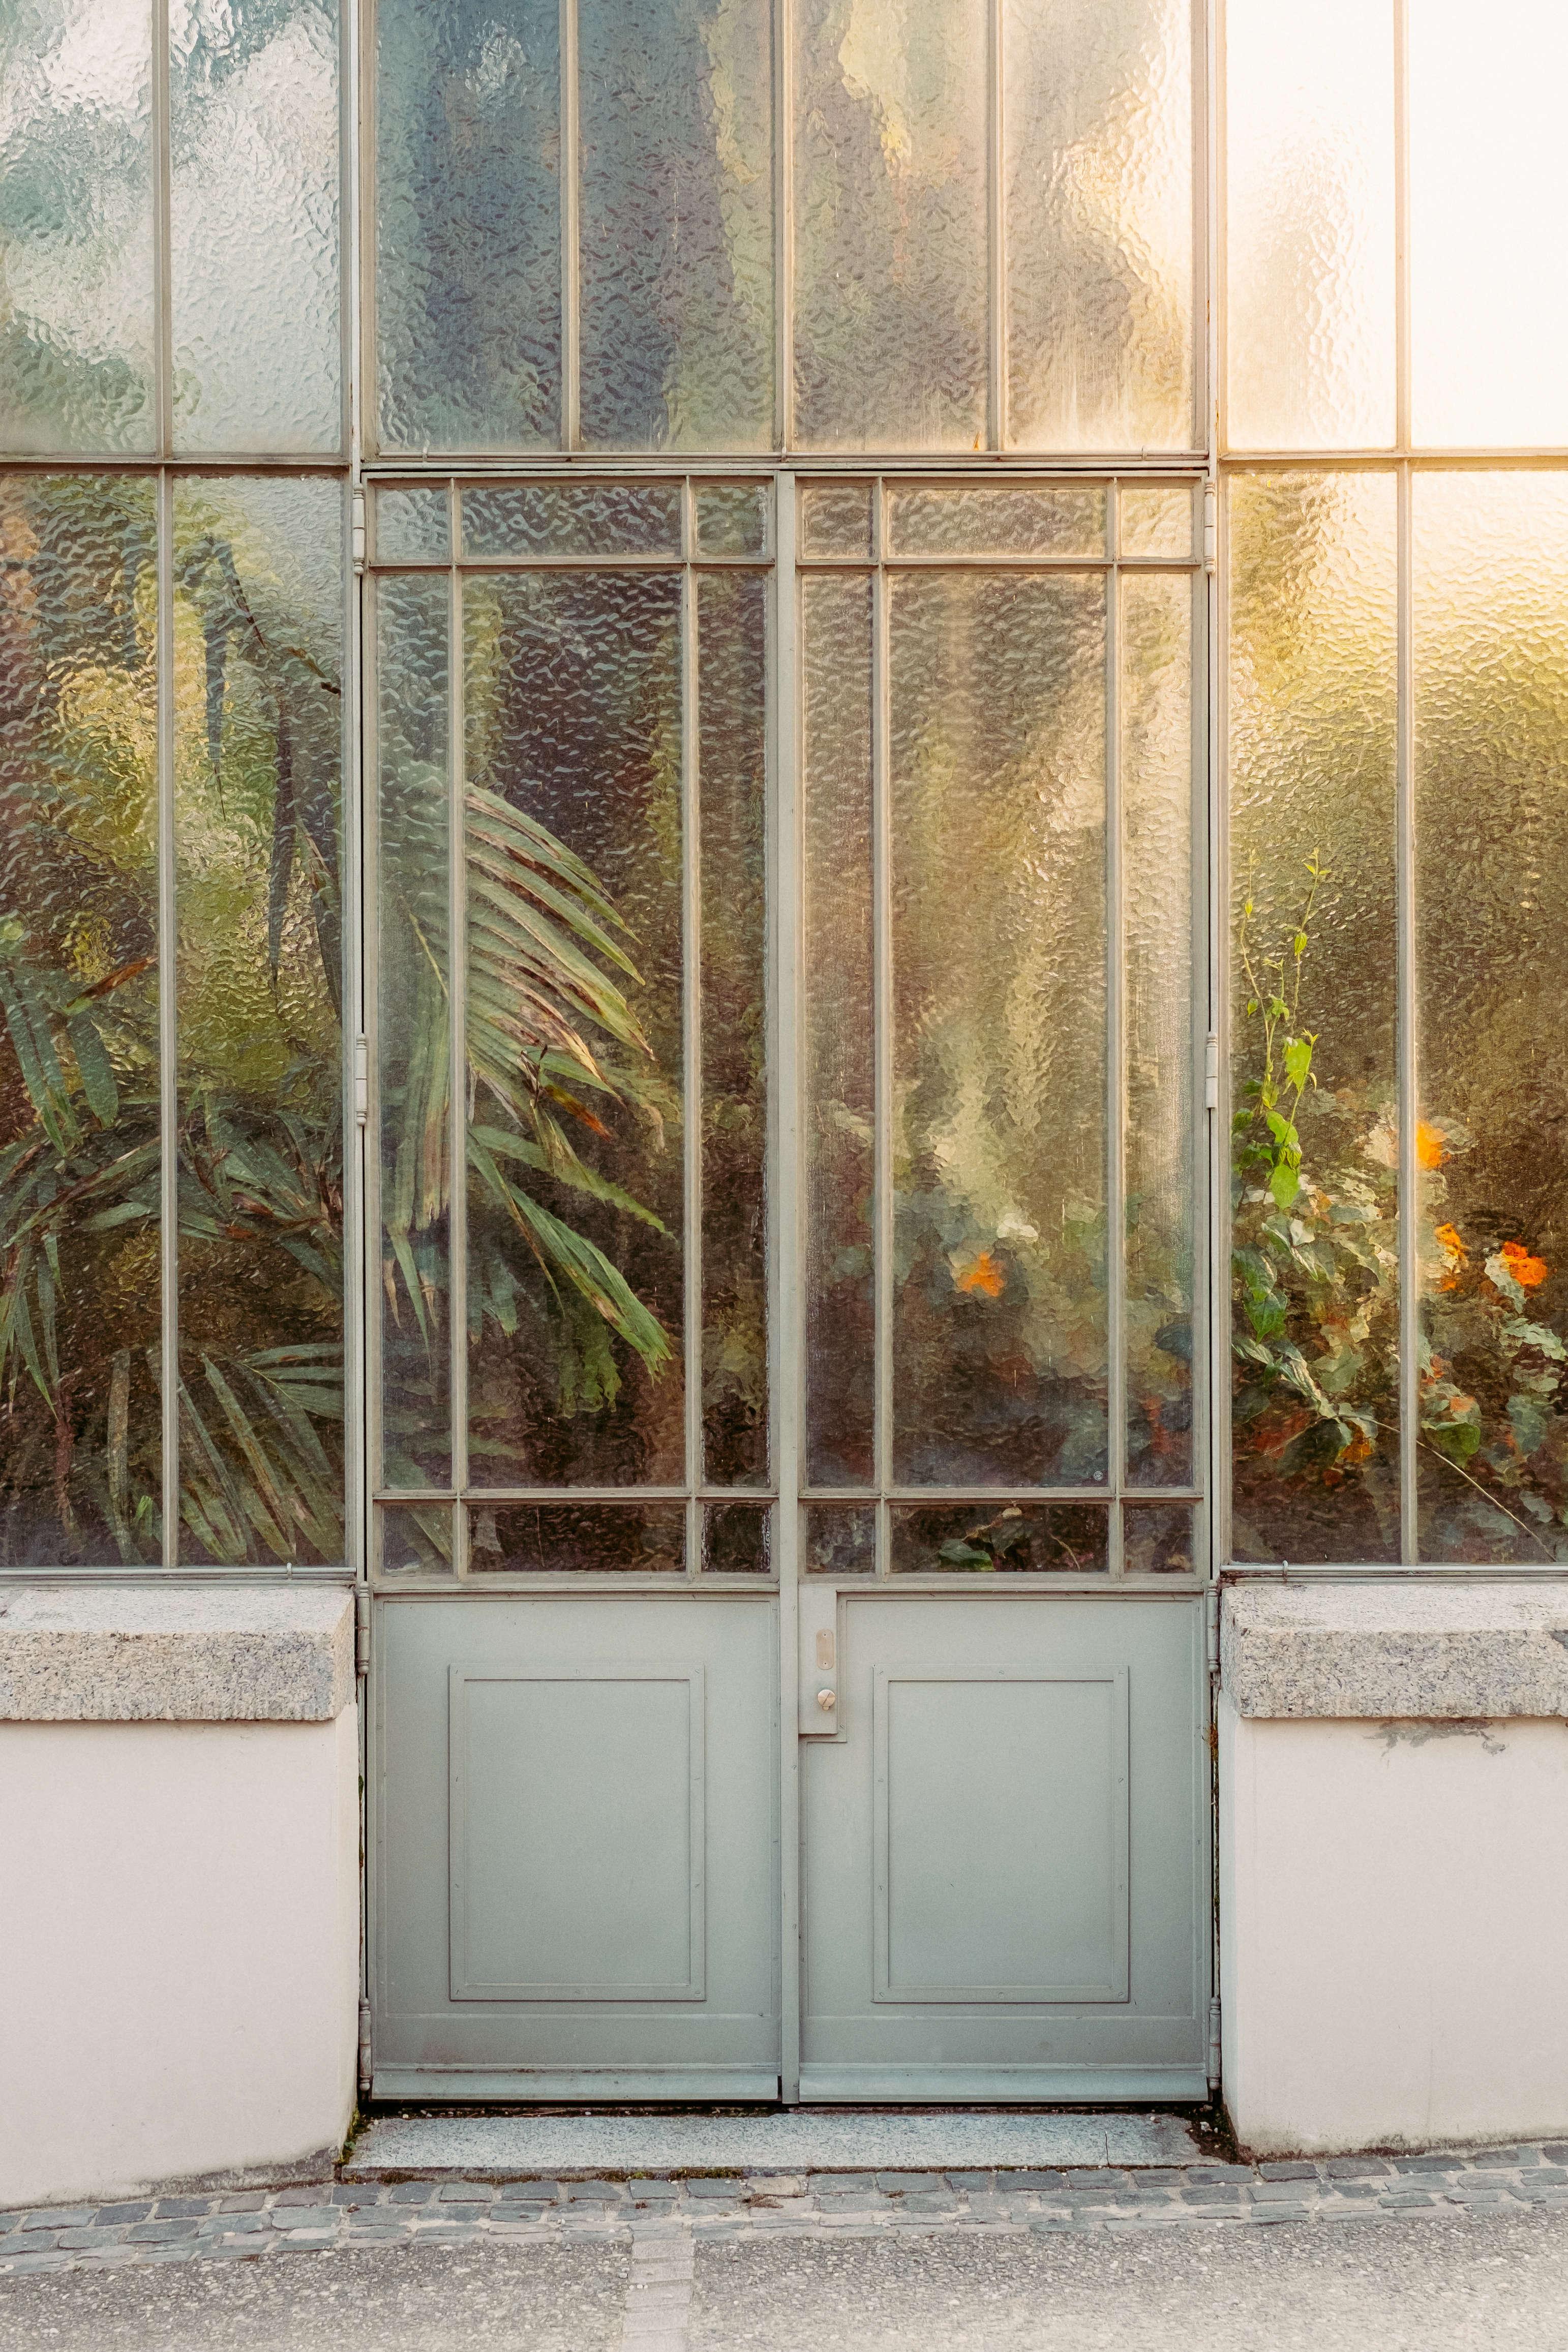 Evergreen Living with Plants Samuel Zeller Botanical Garden in Switzerland